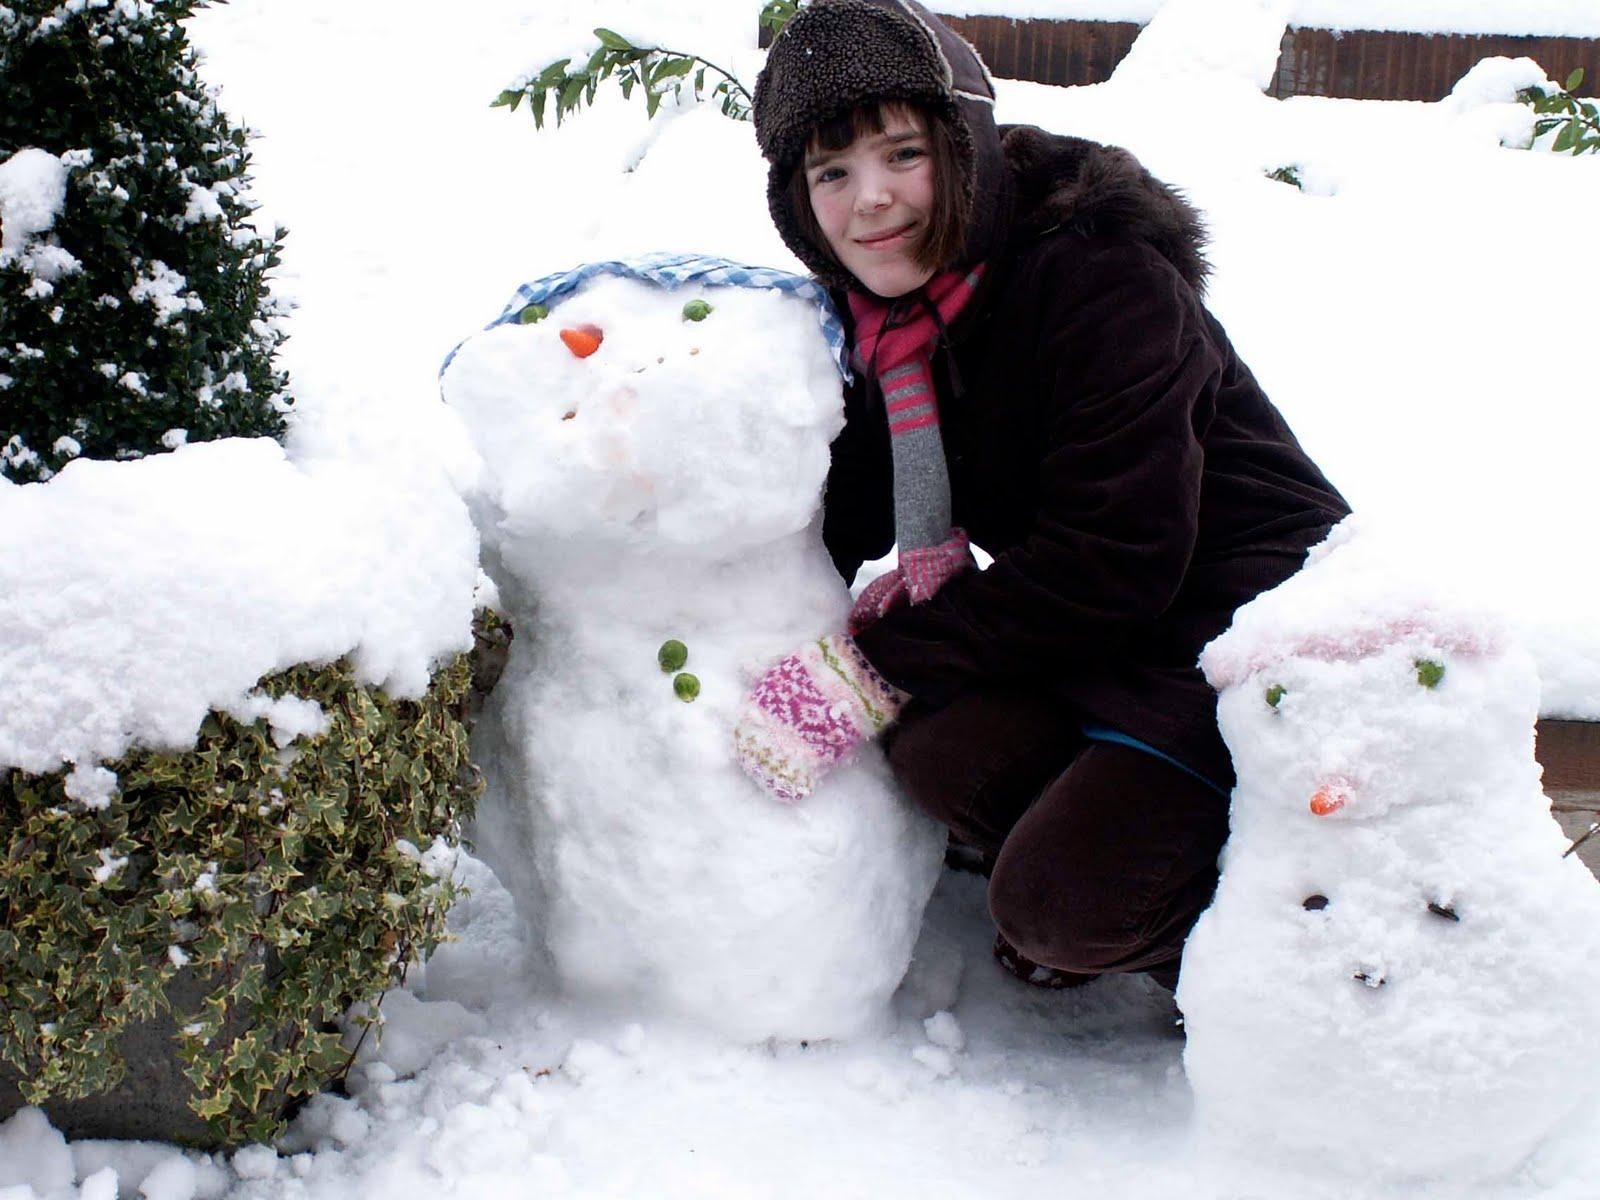 [Snowy+Day+]